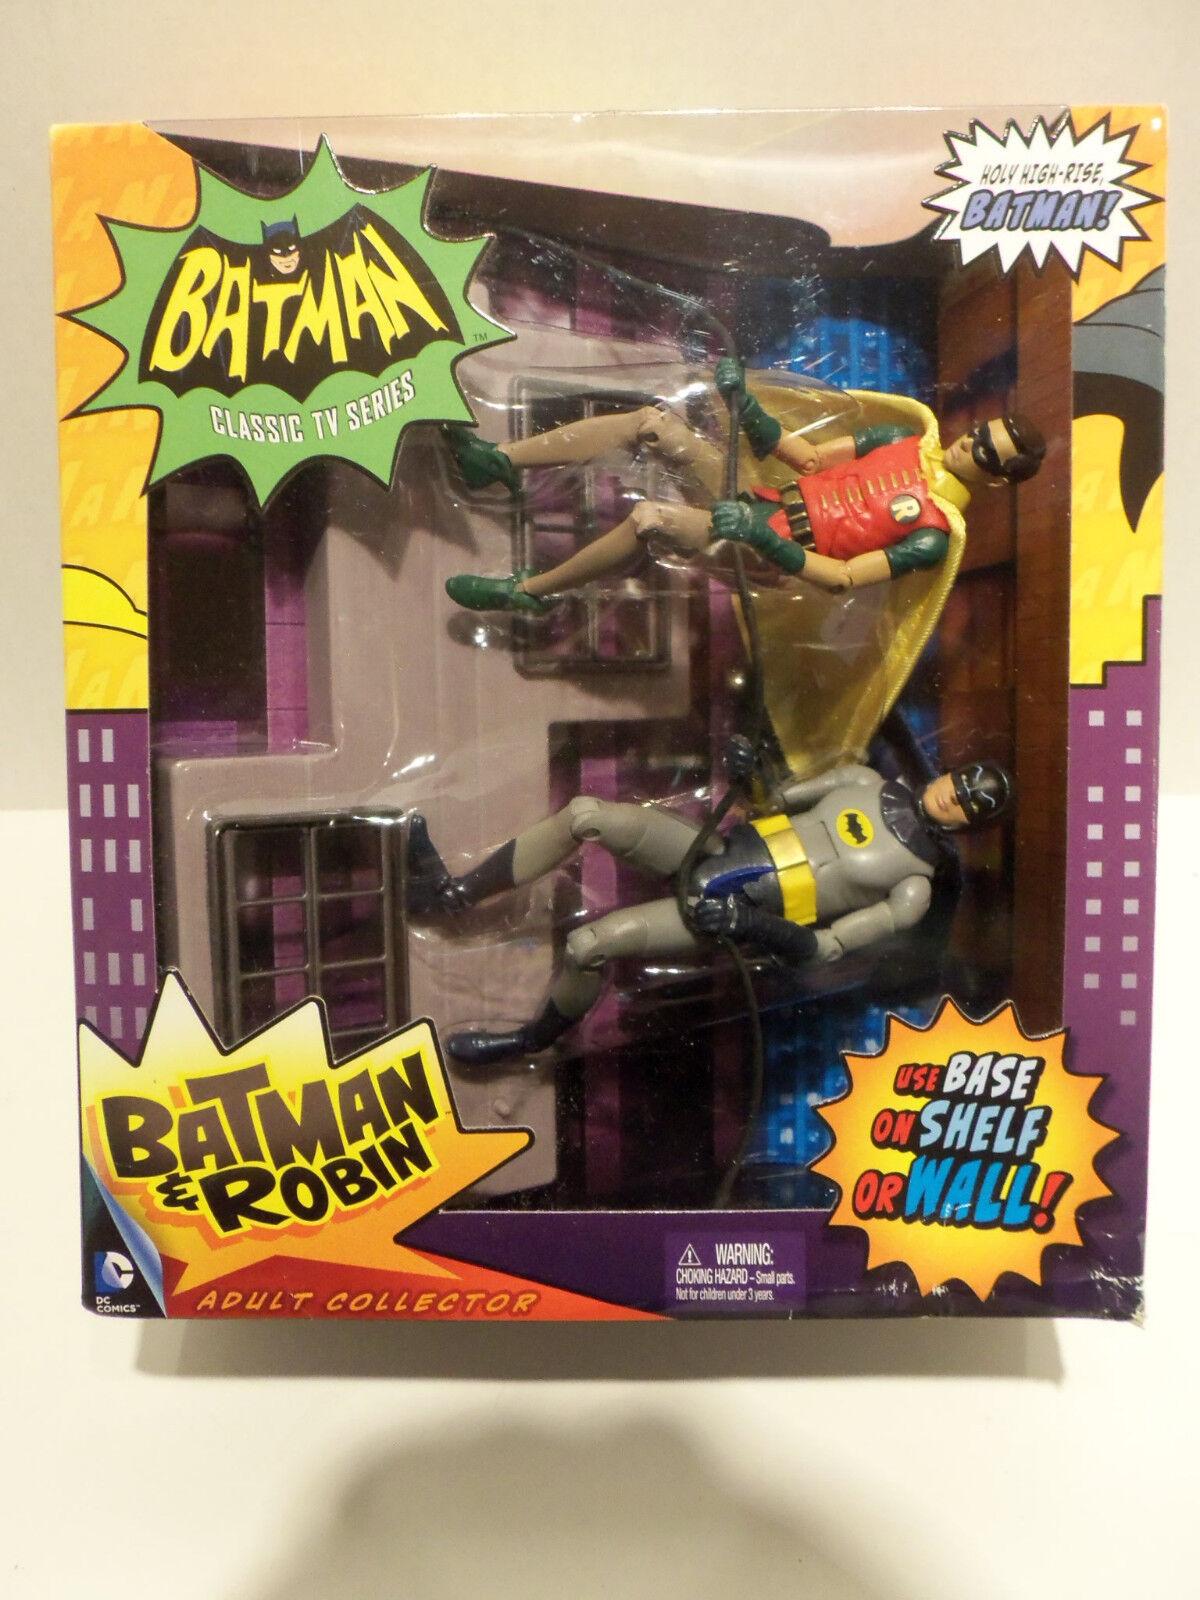 Die klassische tv - serie batman batman & robin erwachsene sammler 1966 abbildung mattel